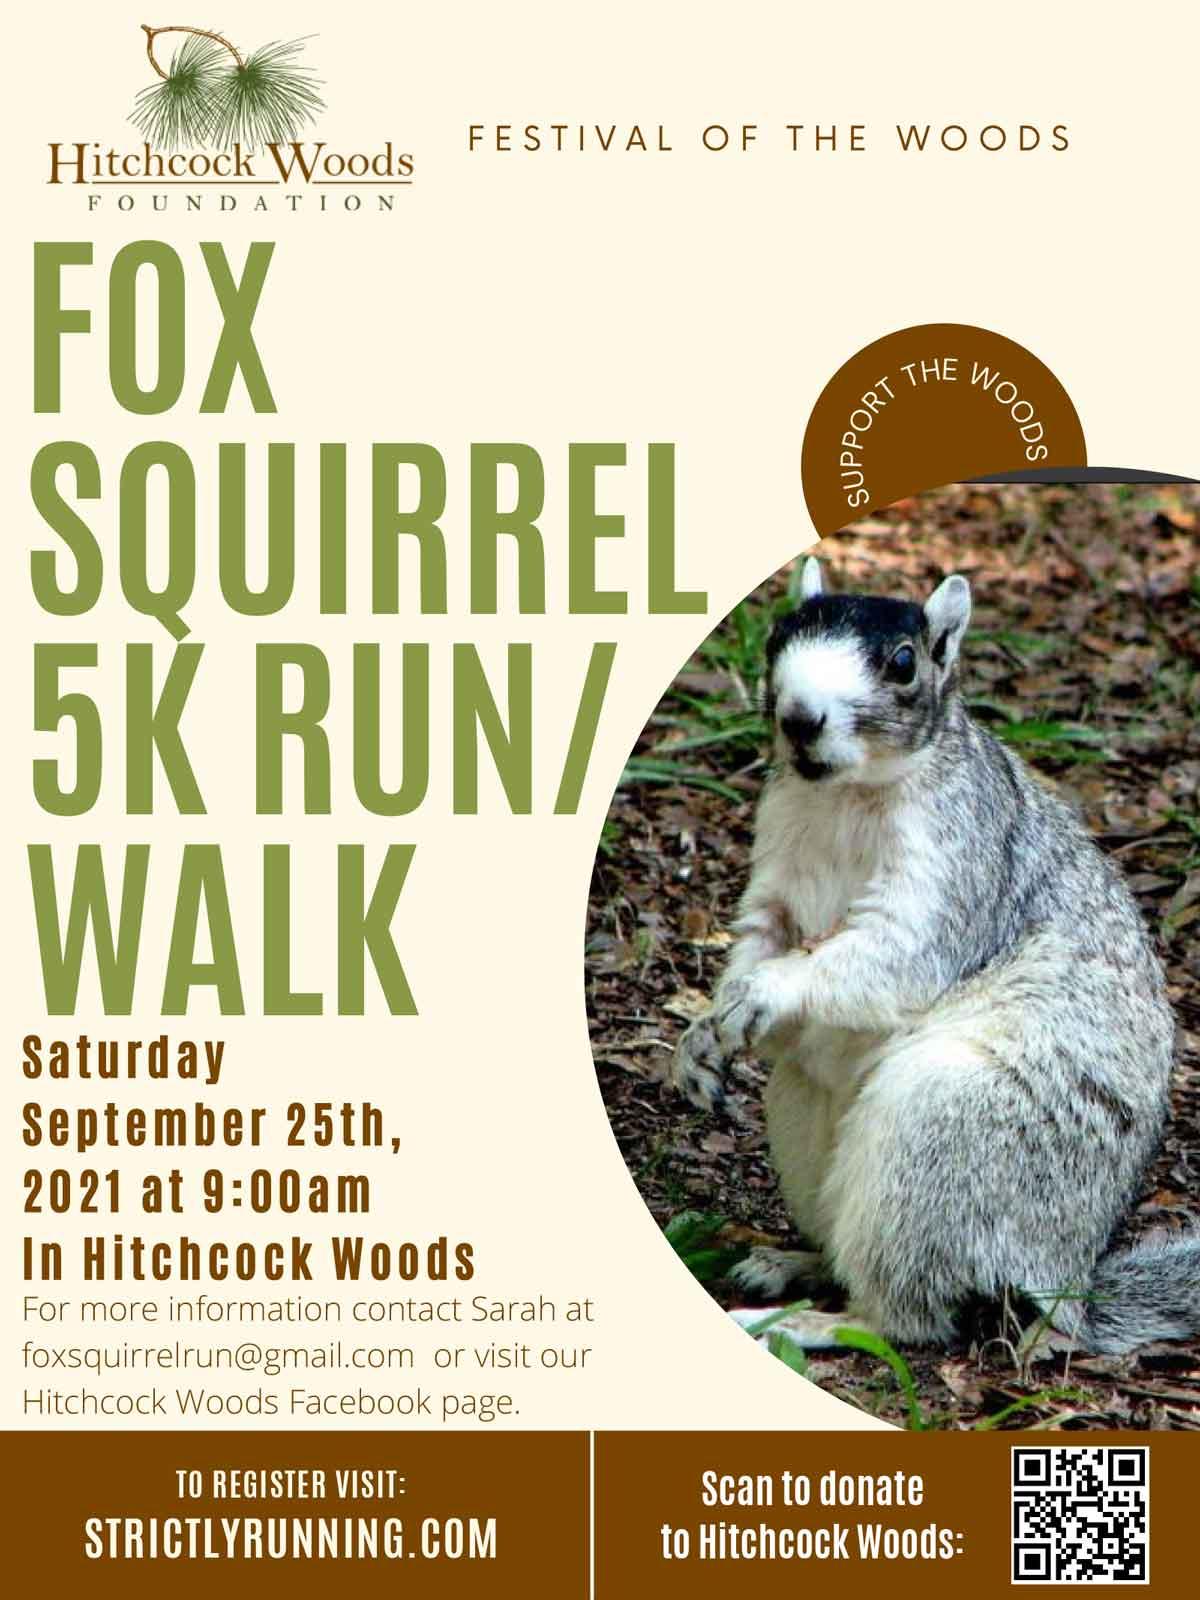 Fox Squirrel 5k Run/Walk